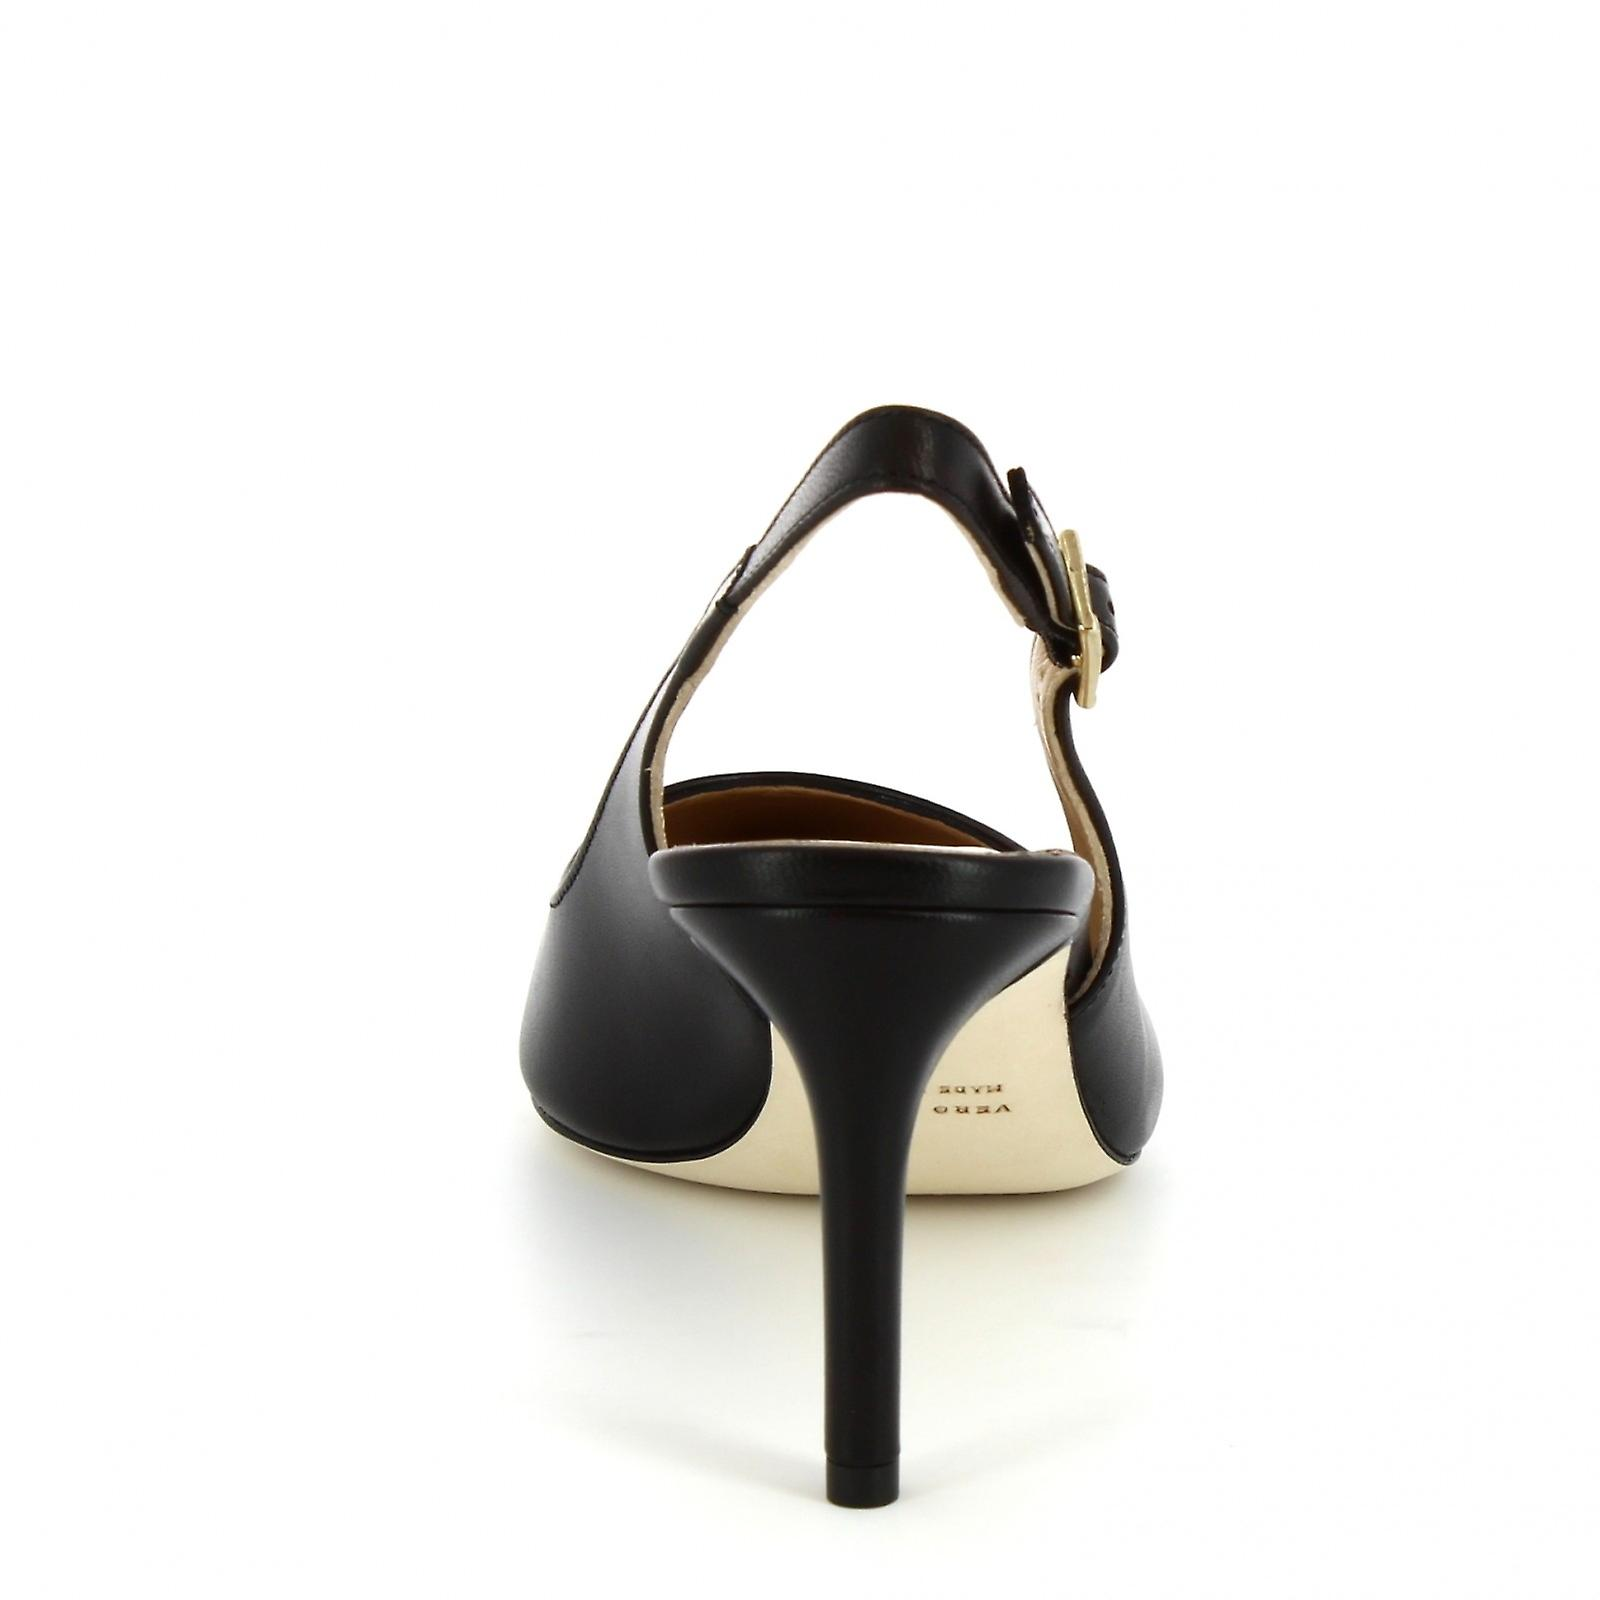 Leonardo Shoes Women's handmade heel slingback sandals in black calf leather